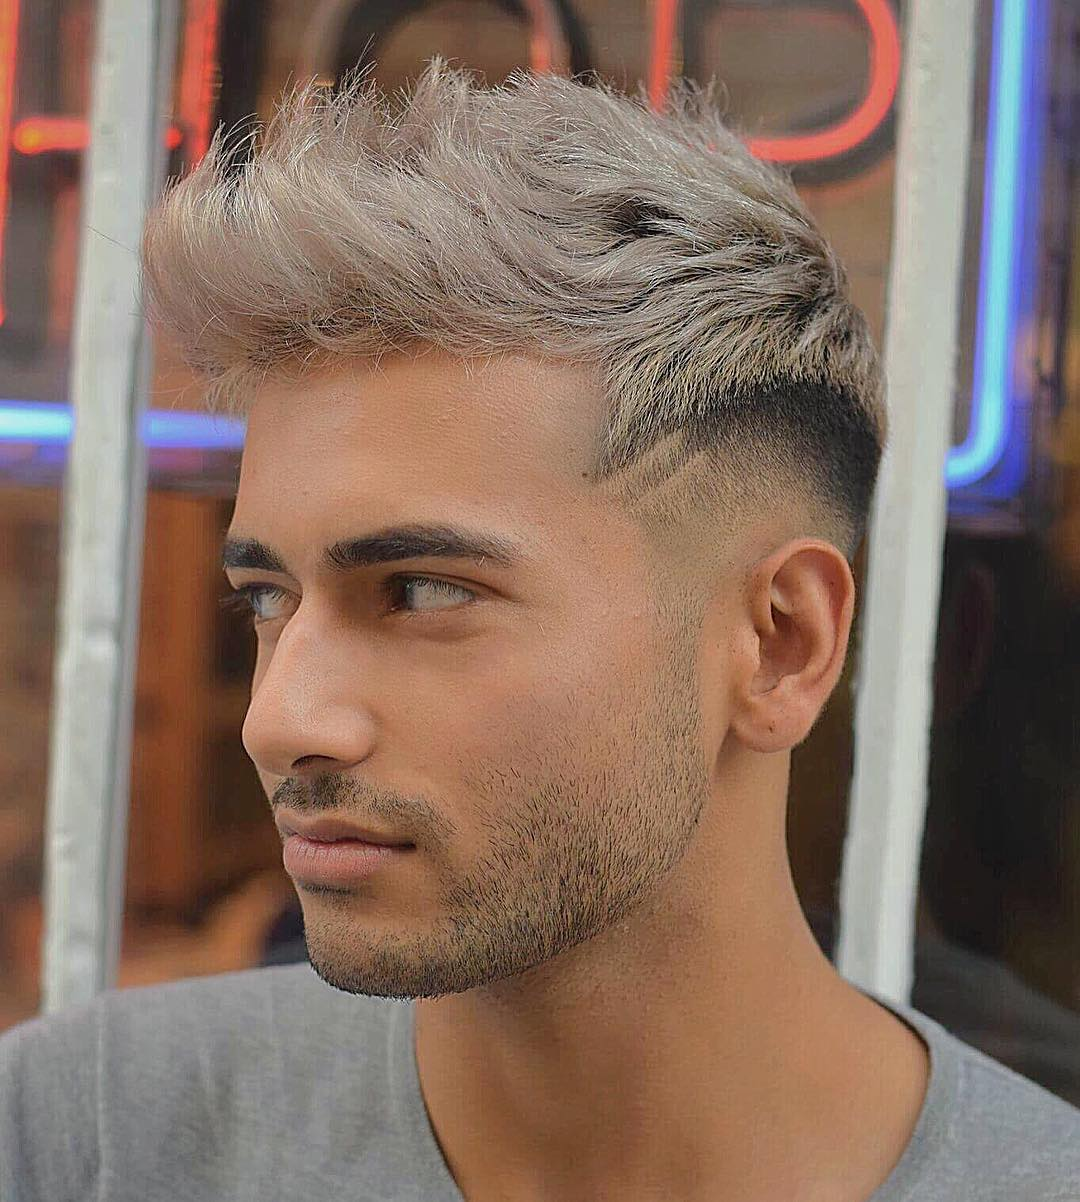 Strange 5 Cool Mid Fade Haircut Styles Short Hairstyles Gunalazisus